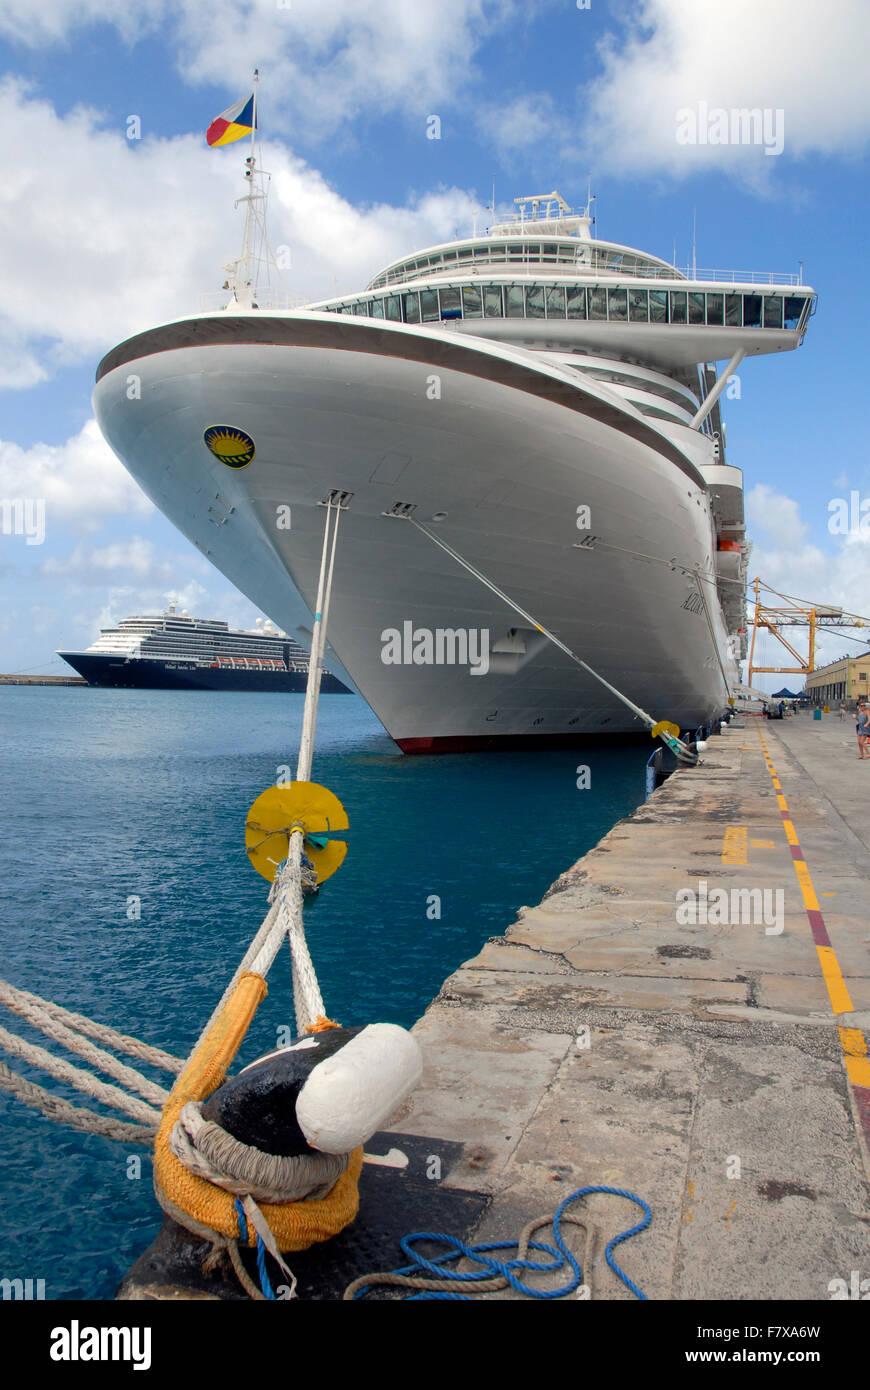 Cruise liners moored, Bridgetown, Barbados - Stock Image